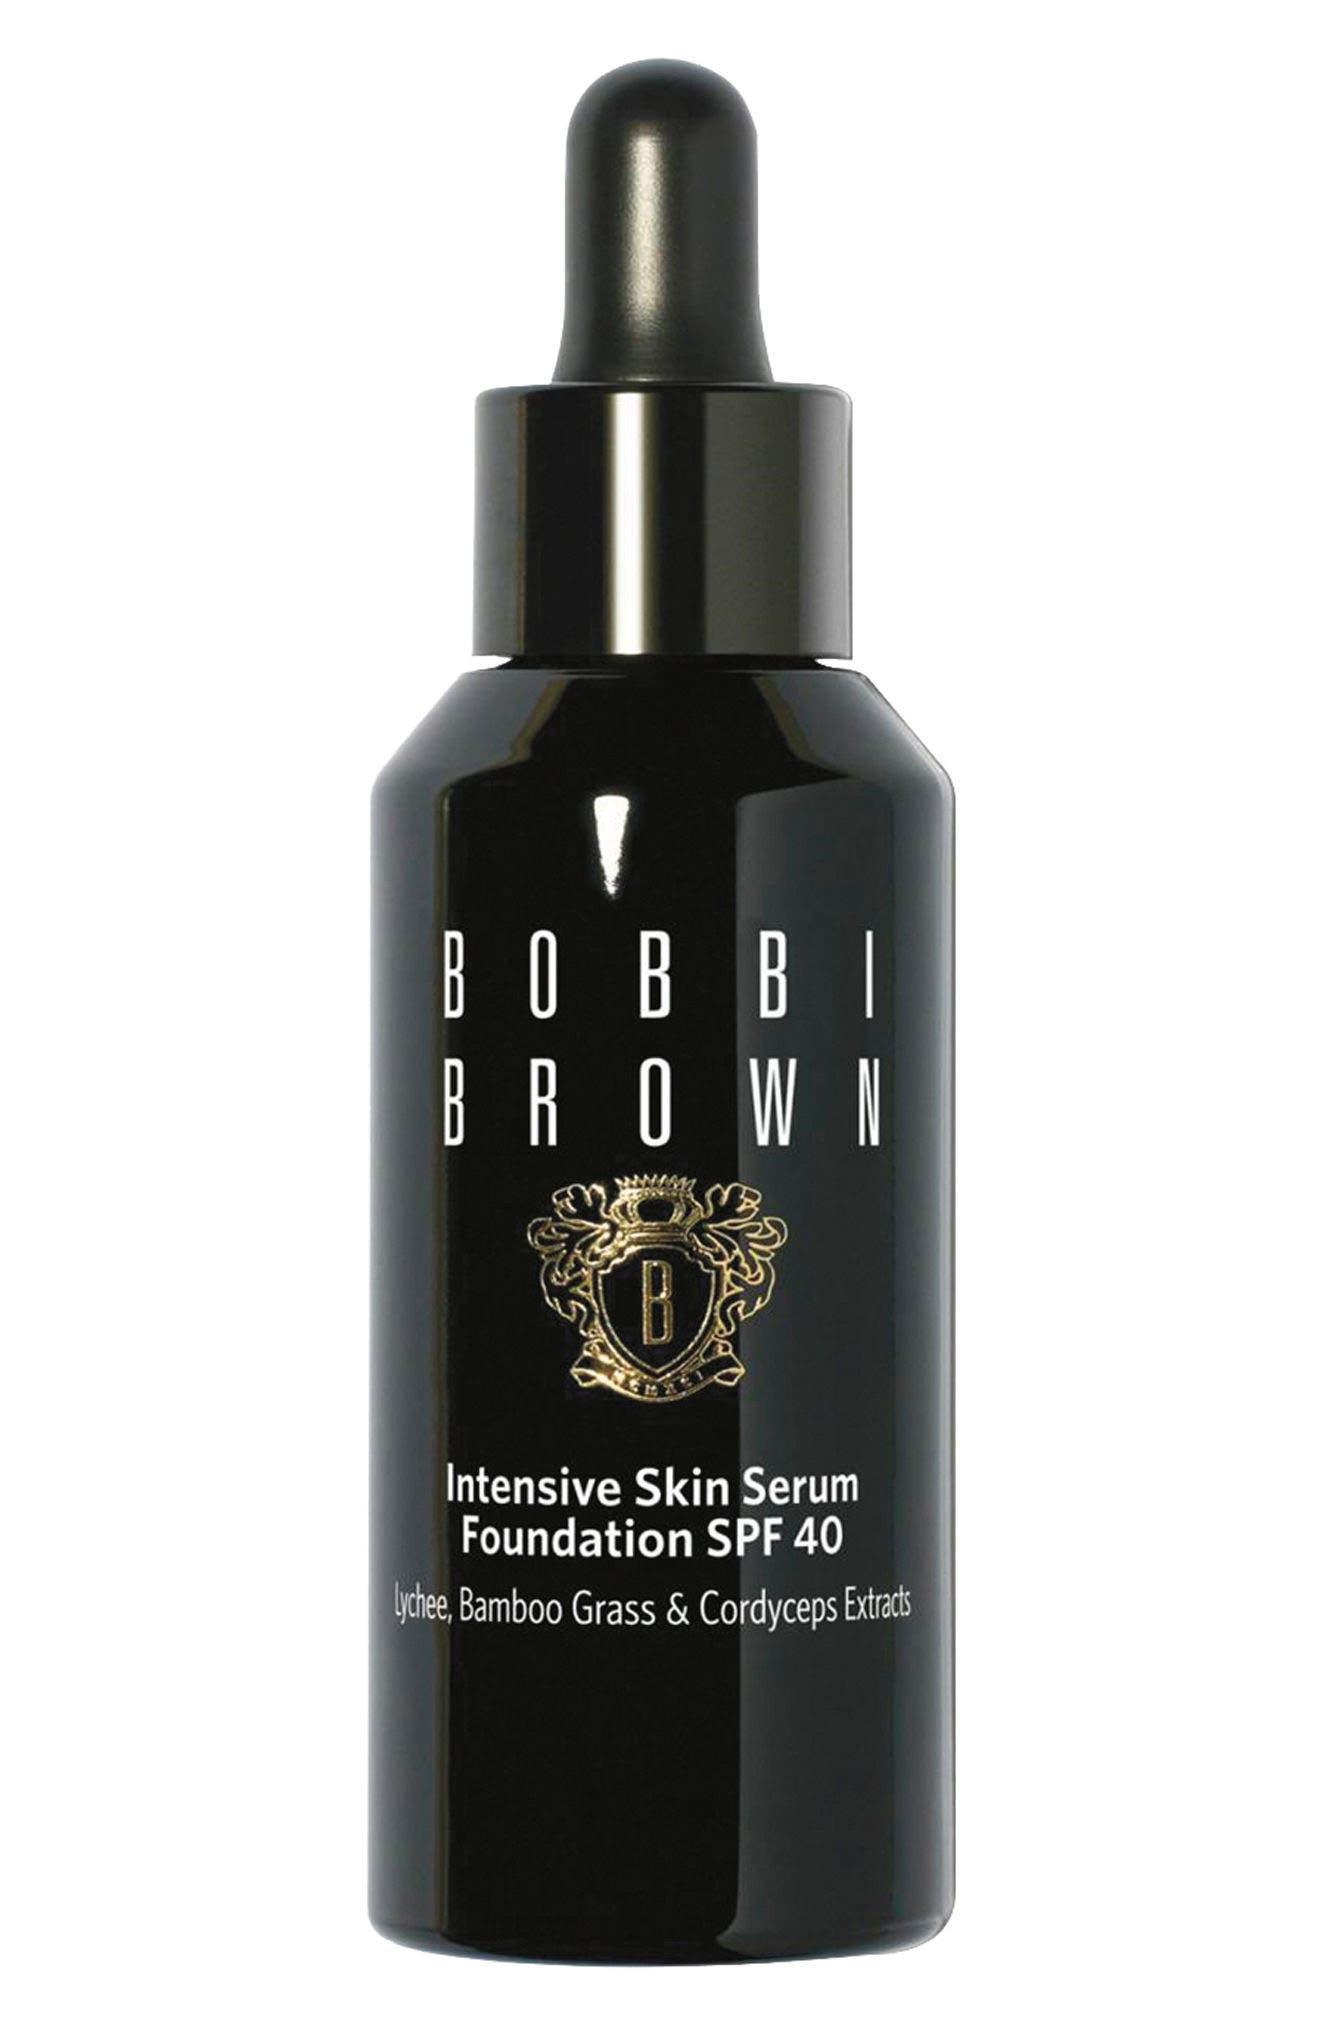 BOBBI BROWN, Intensive Skin Serum Foundation SPF 40, Main thumbnail 1, color, 06.5 WARM ALMOND